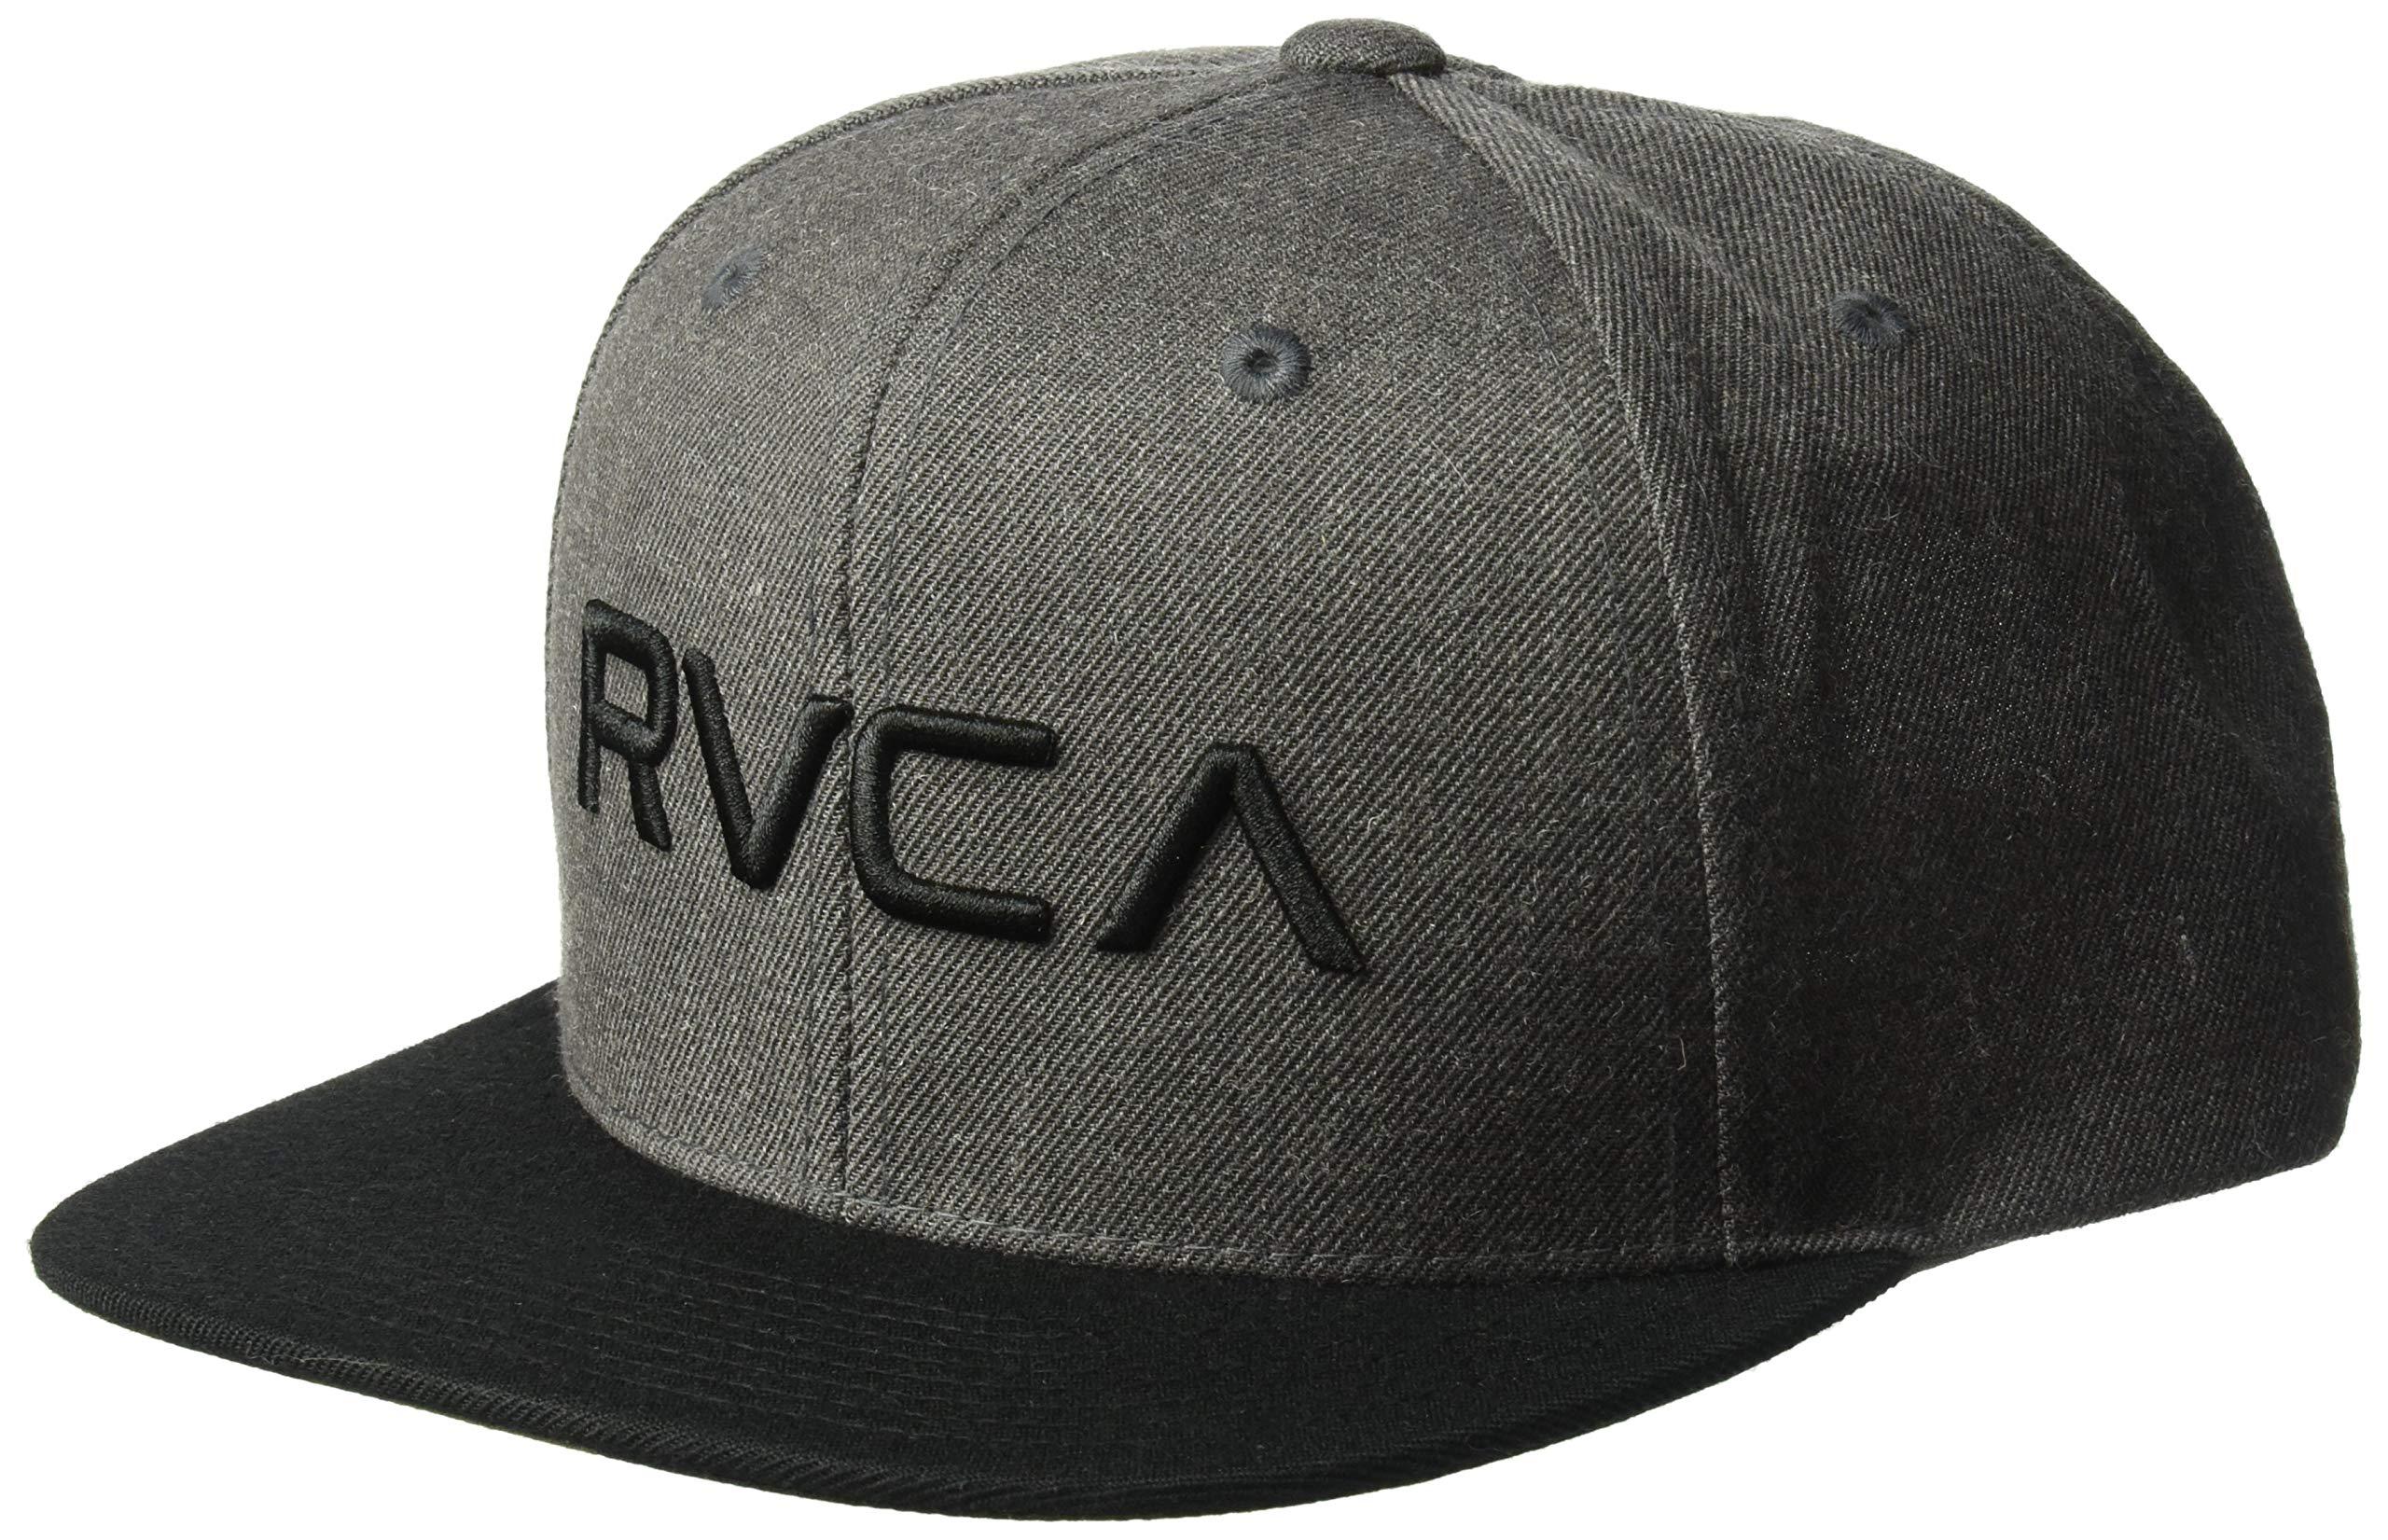 RVCA Big Boys' Twill Snapback Hat, Charcoal Heather/Black, One Size